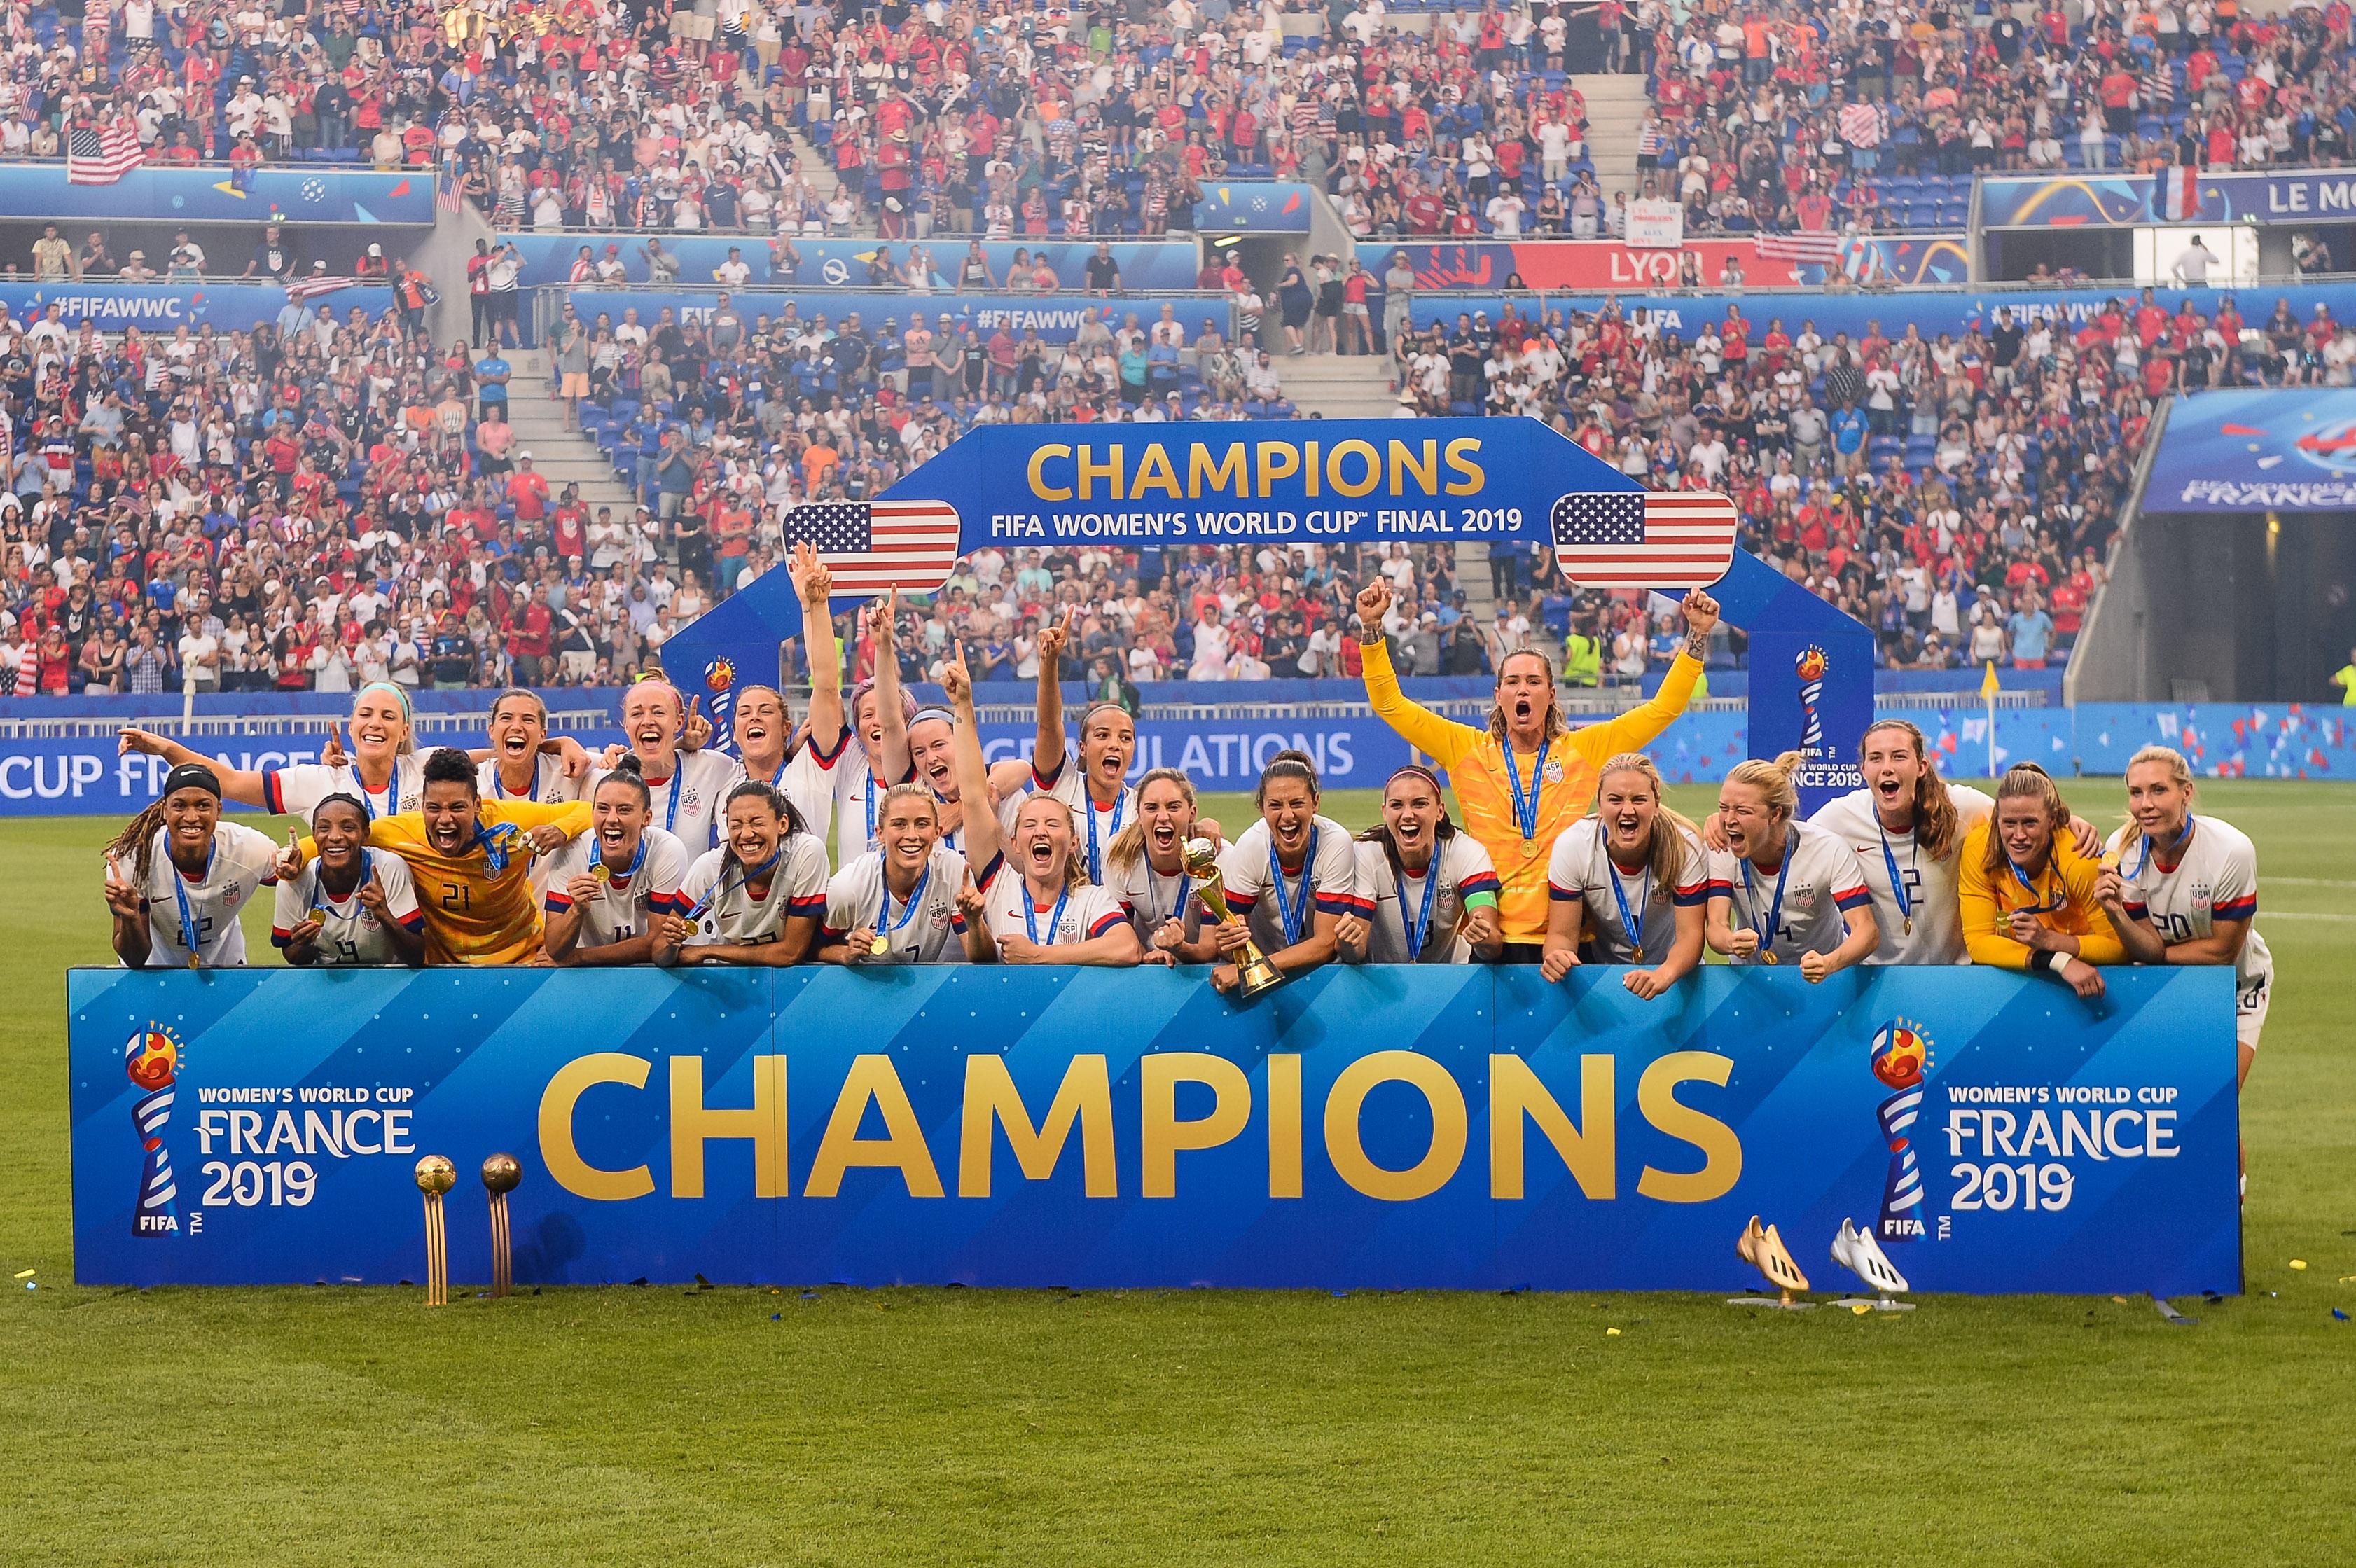 FIFA Women's World Cup Winners List – Since 1991 to 2019